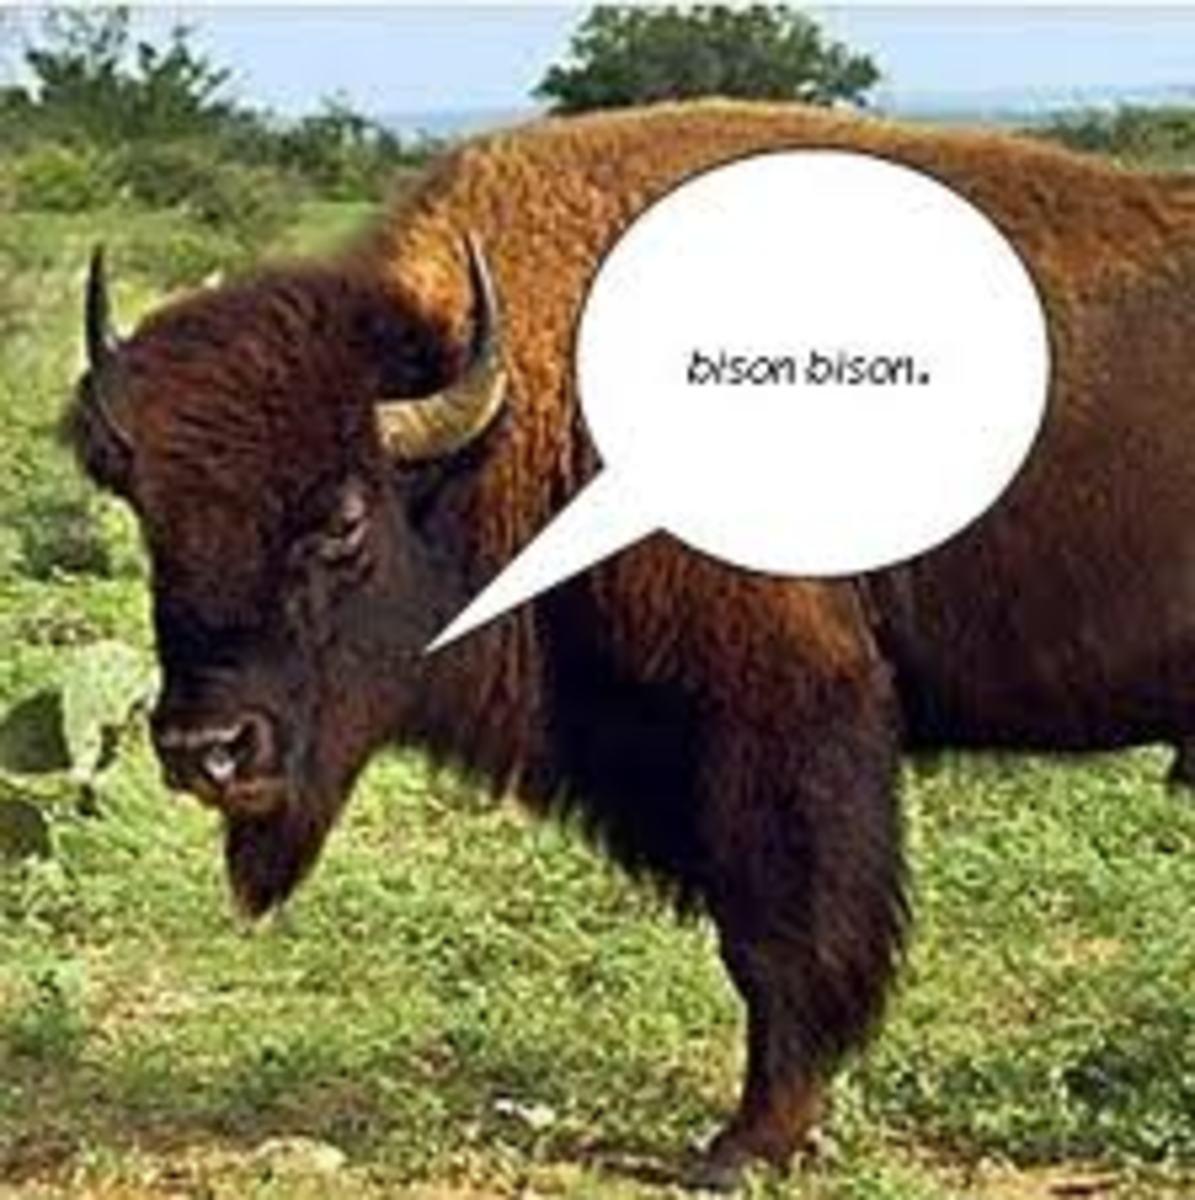 bison-beefalo-or-belgian-blue-angus-cattle-genetics-industry-evolves